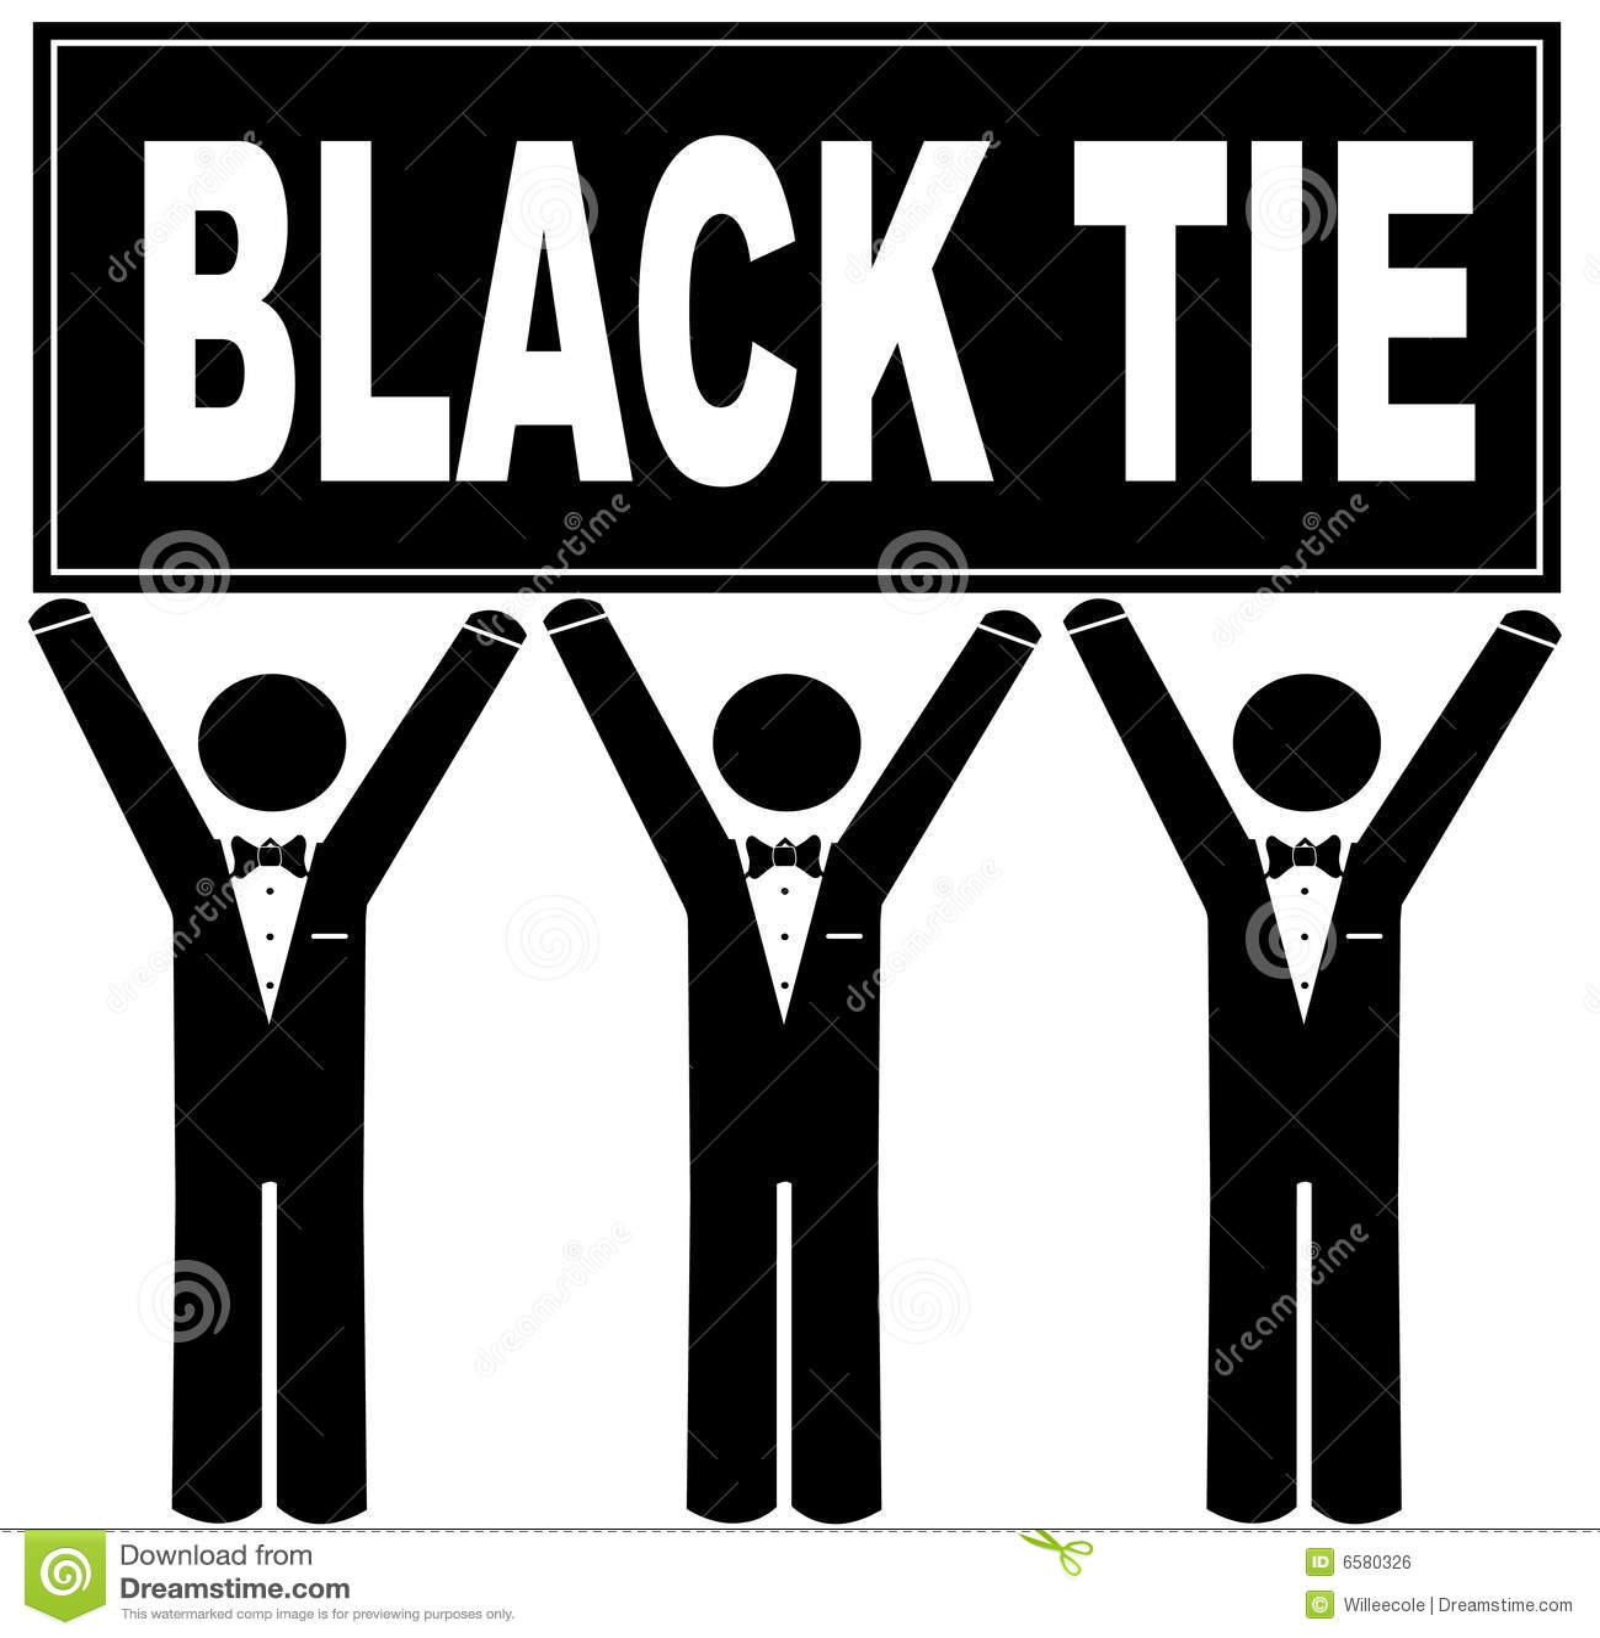 Black Tie Event Royalty Free Stock Image Image 6580326